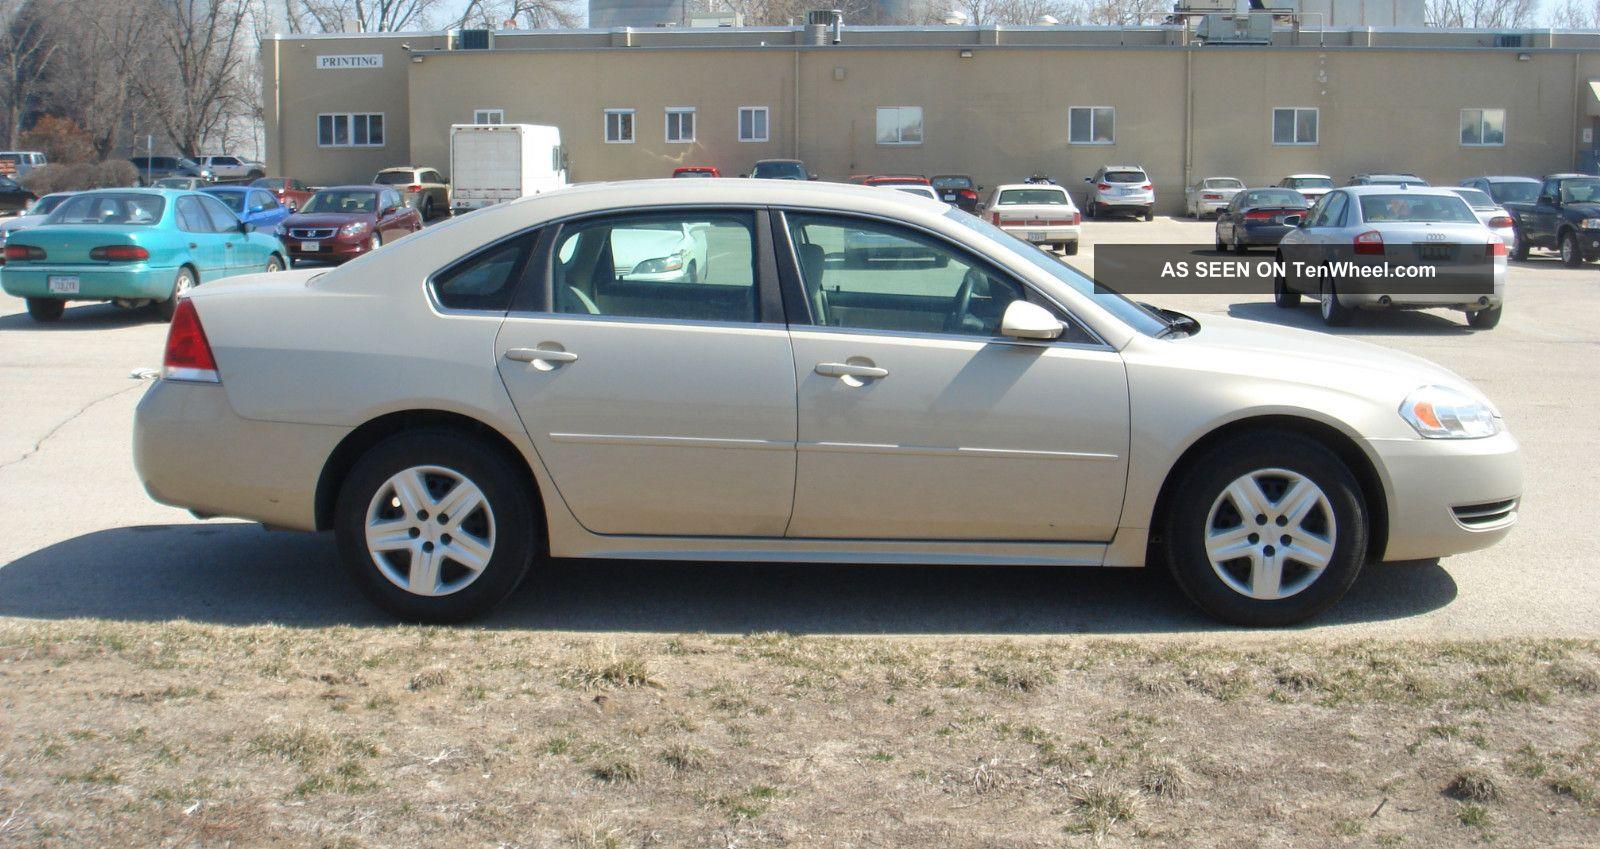 2010 chevrolet impala ls 4 door sedan. Cars Review. Best American Auto & Cars Review